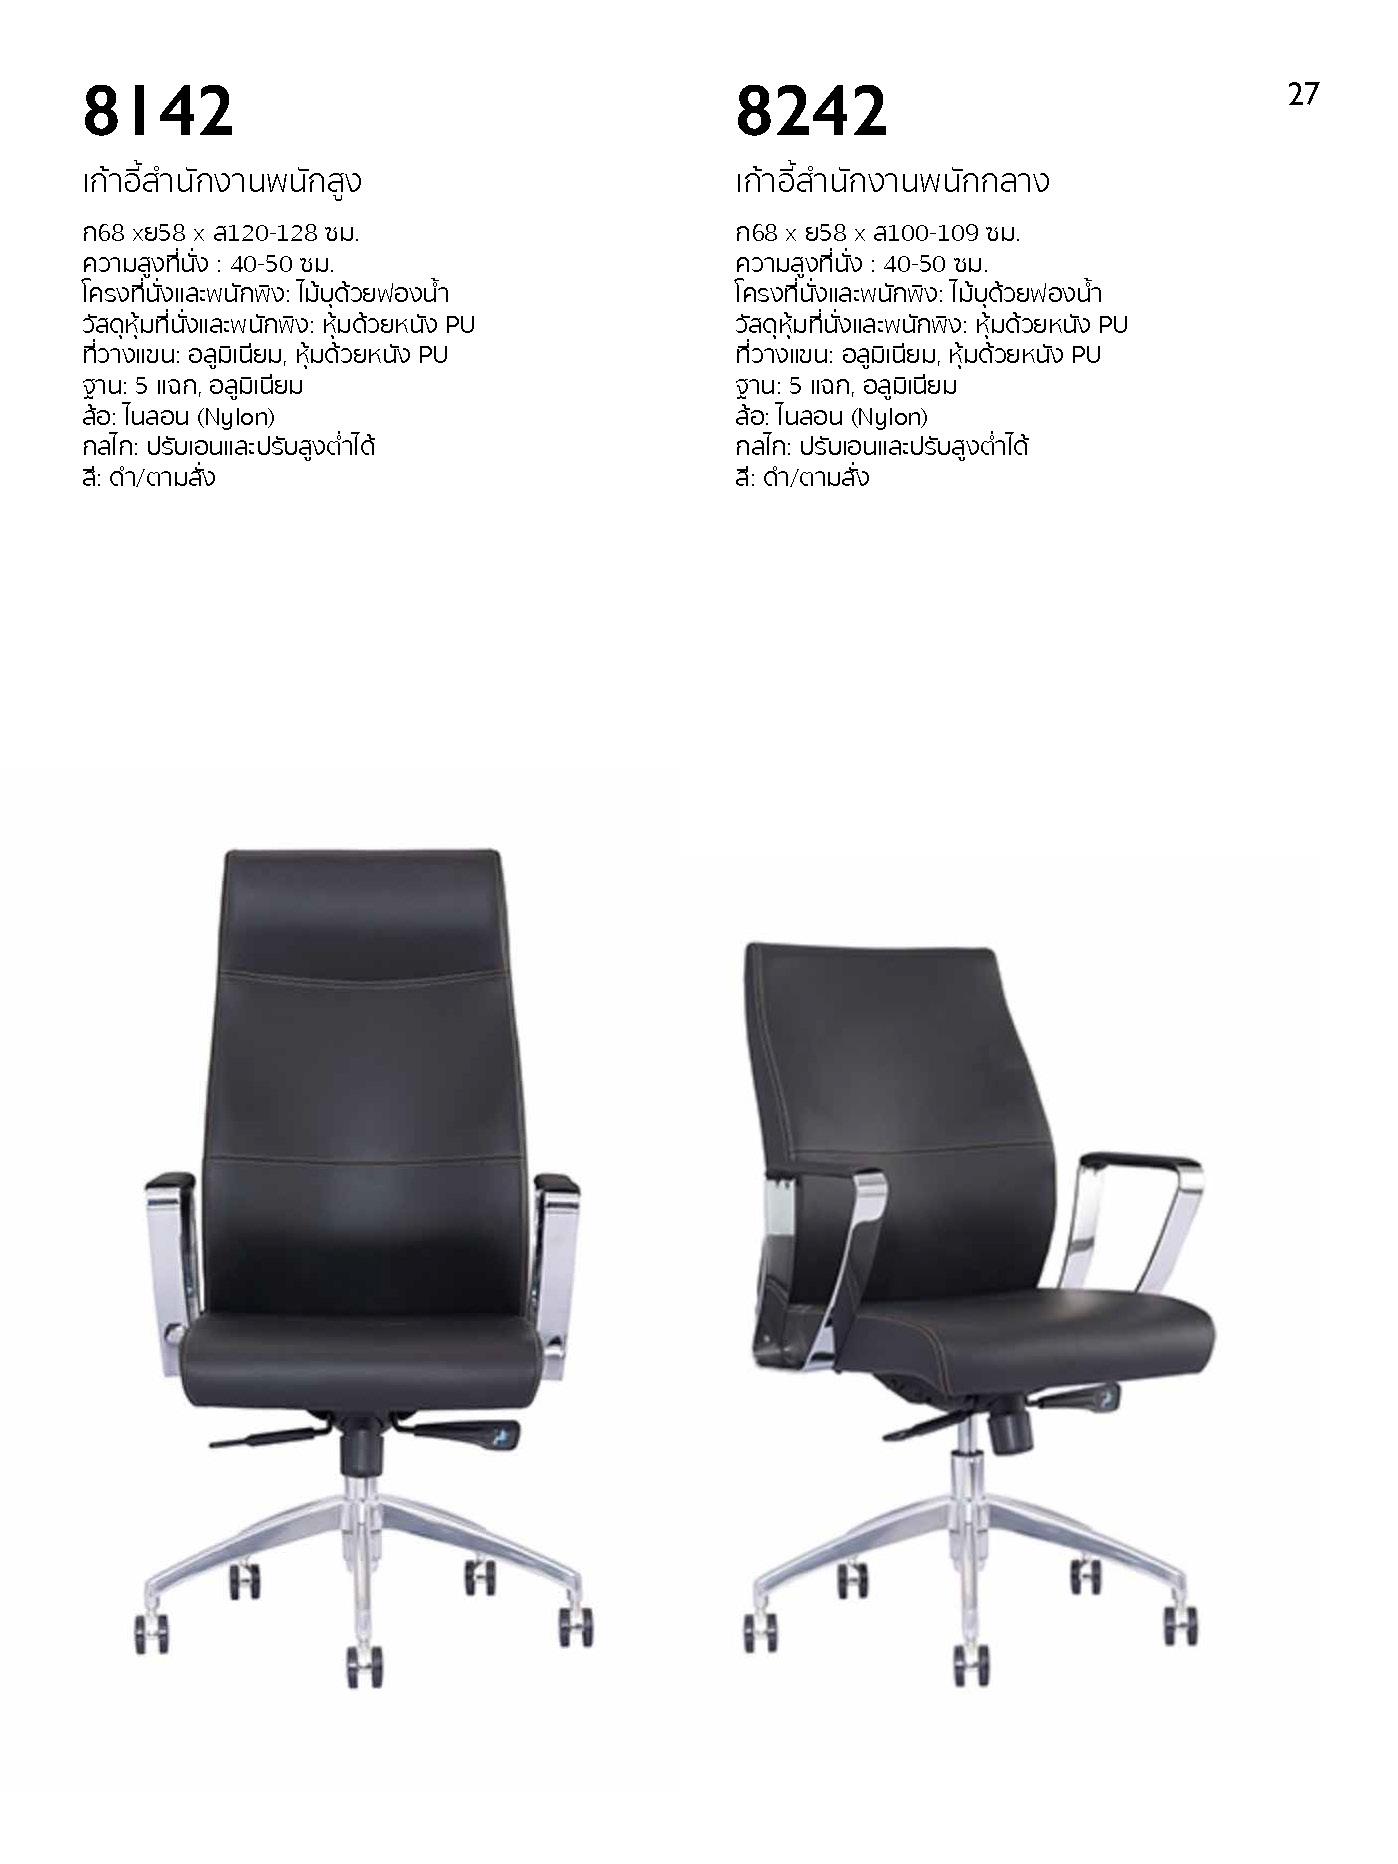 Top Furniture Catalog 2019_Page_62.jpg